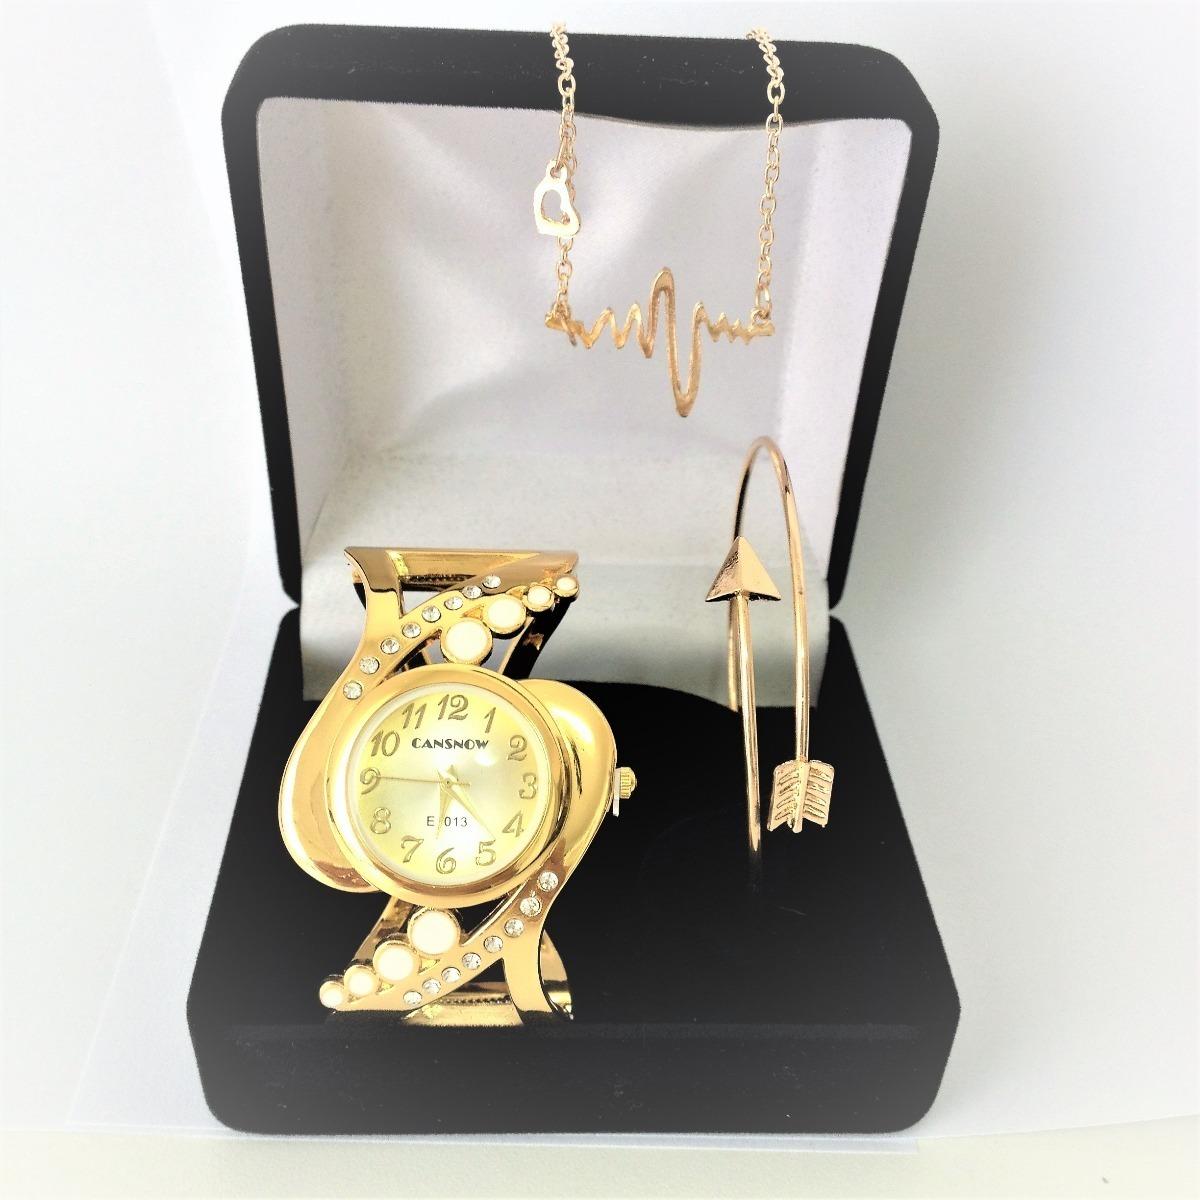 4c19fa0f538 kit bracelete feminino + relogio + colar barato presente. Carregando zoom.